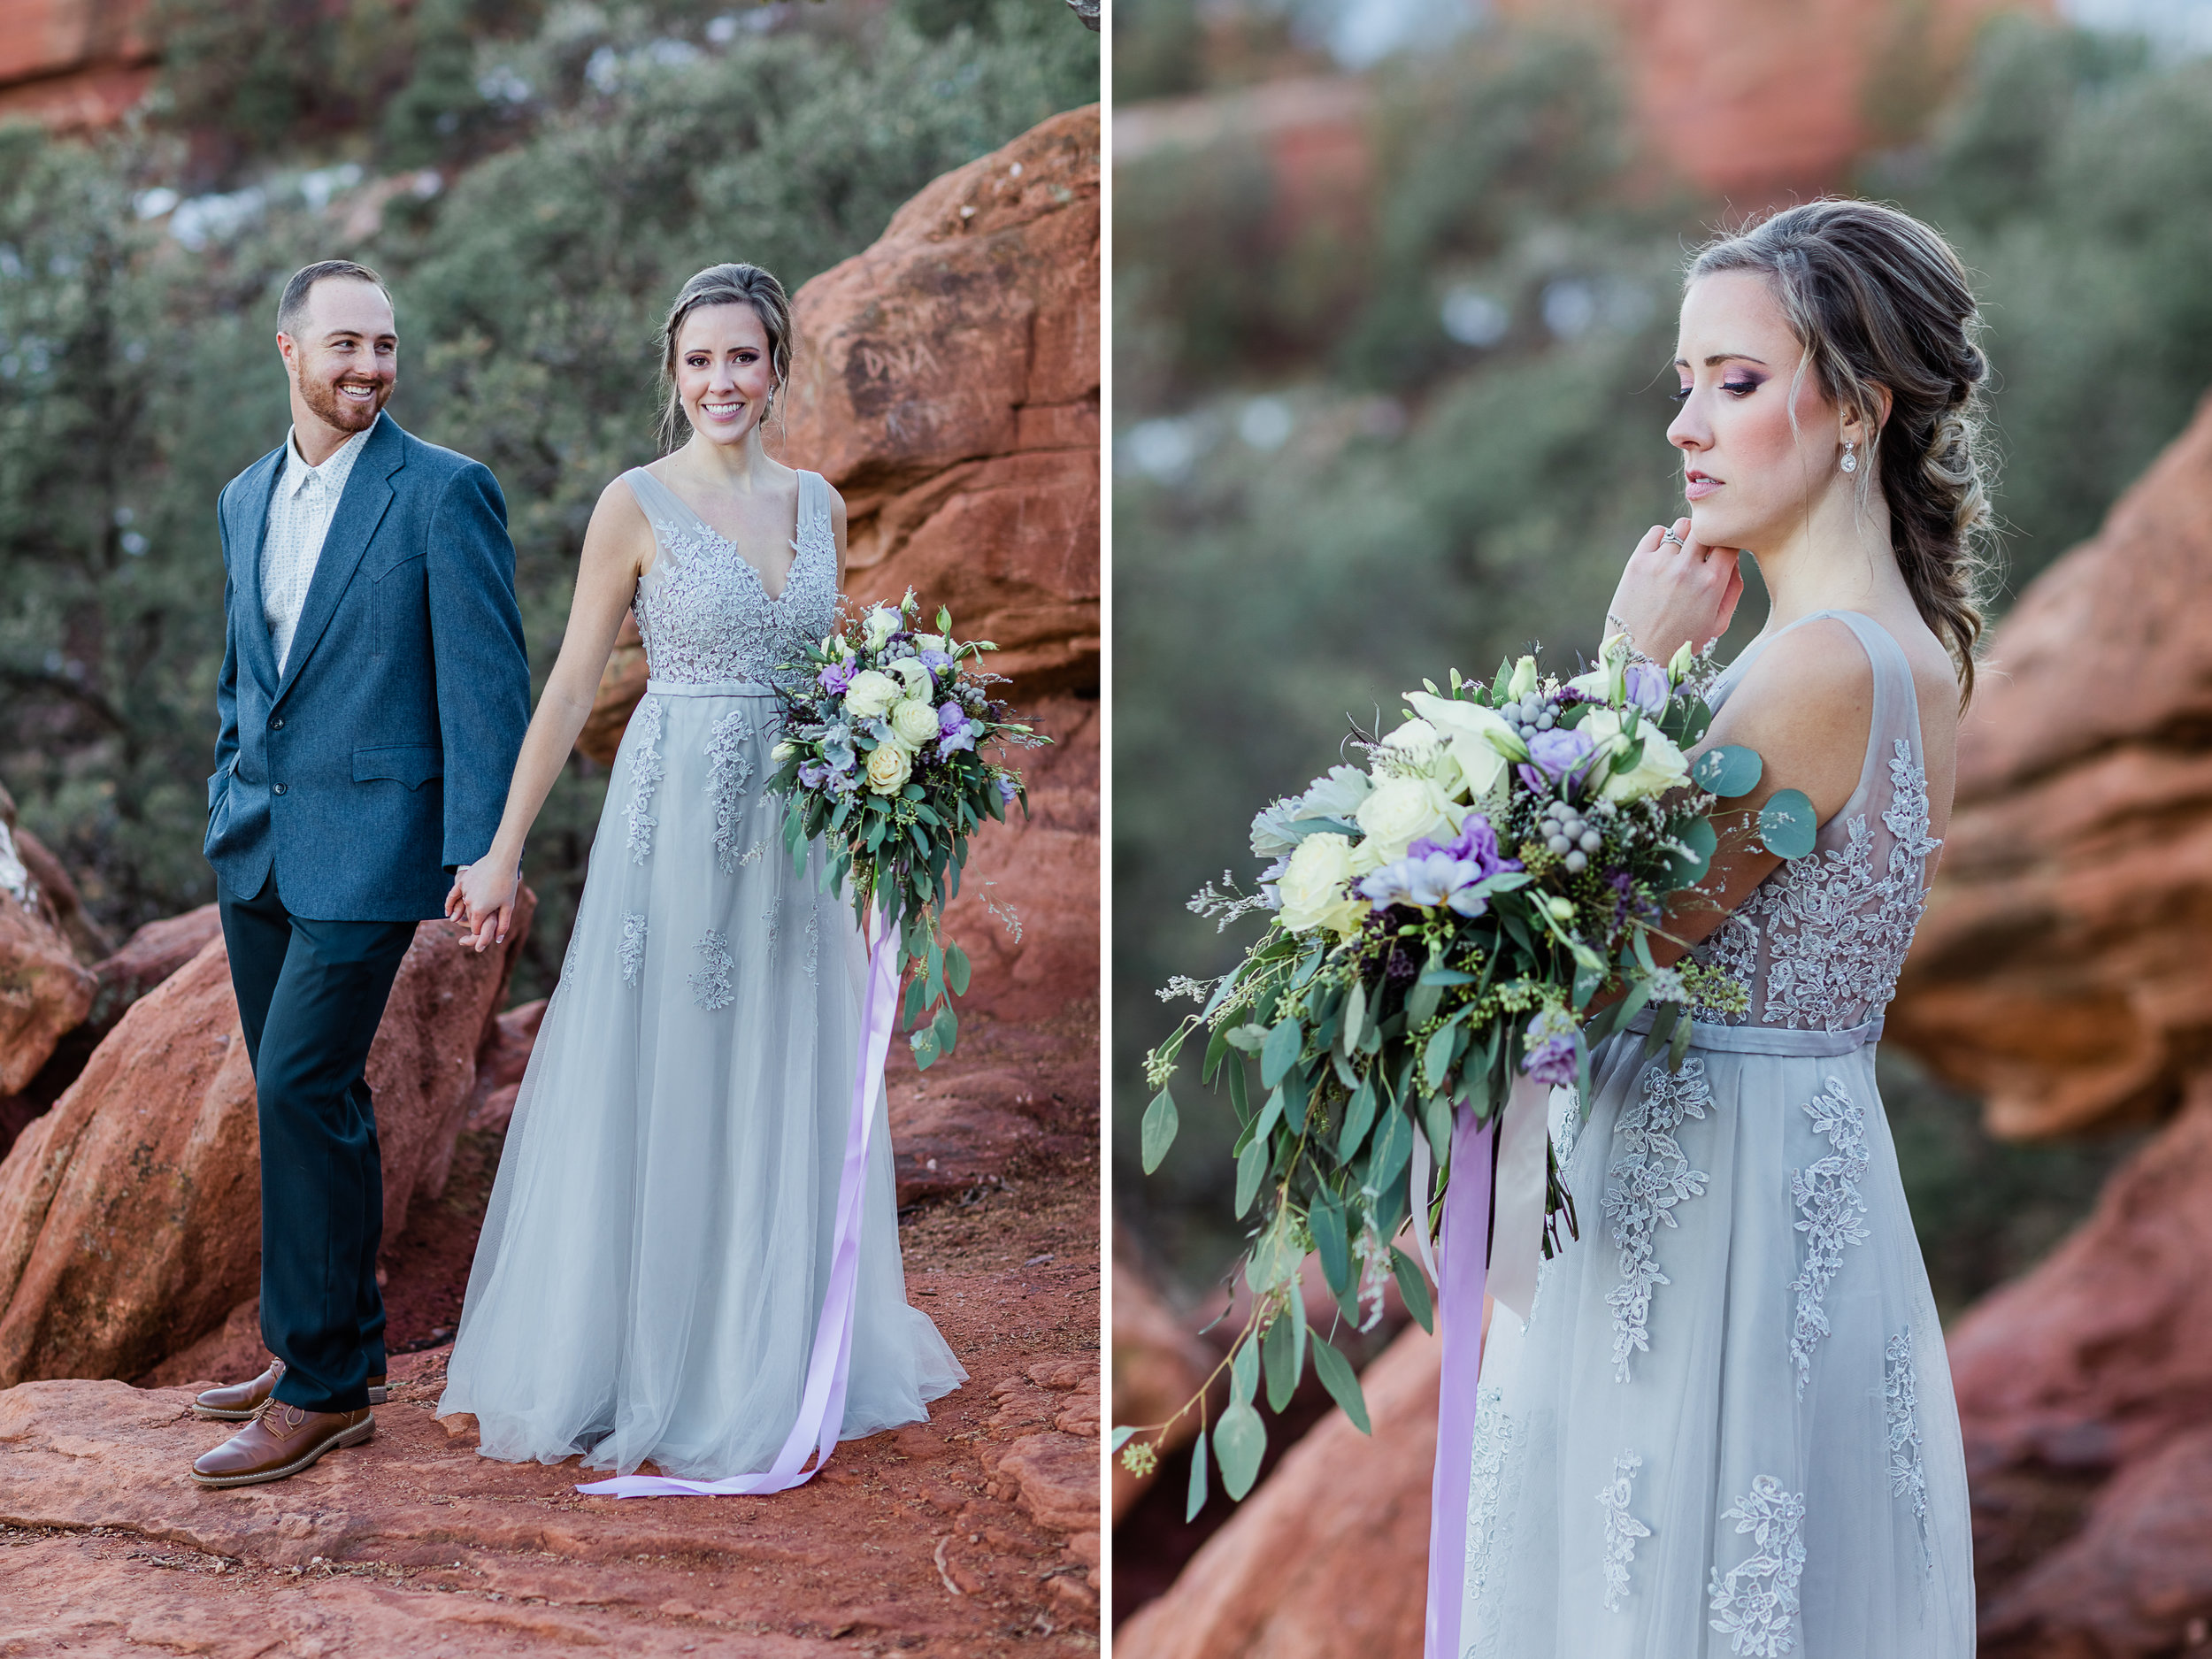 Colorado Springs Wedding Photographer 5.jpg